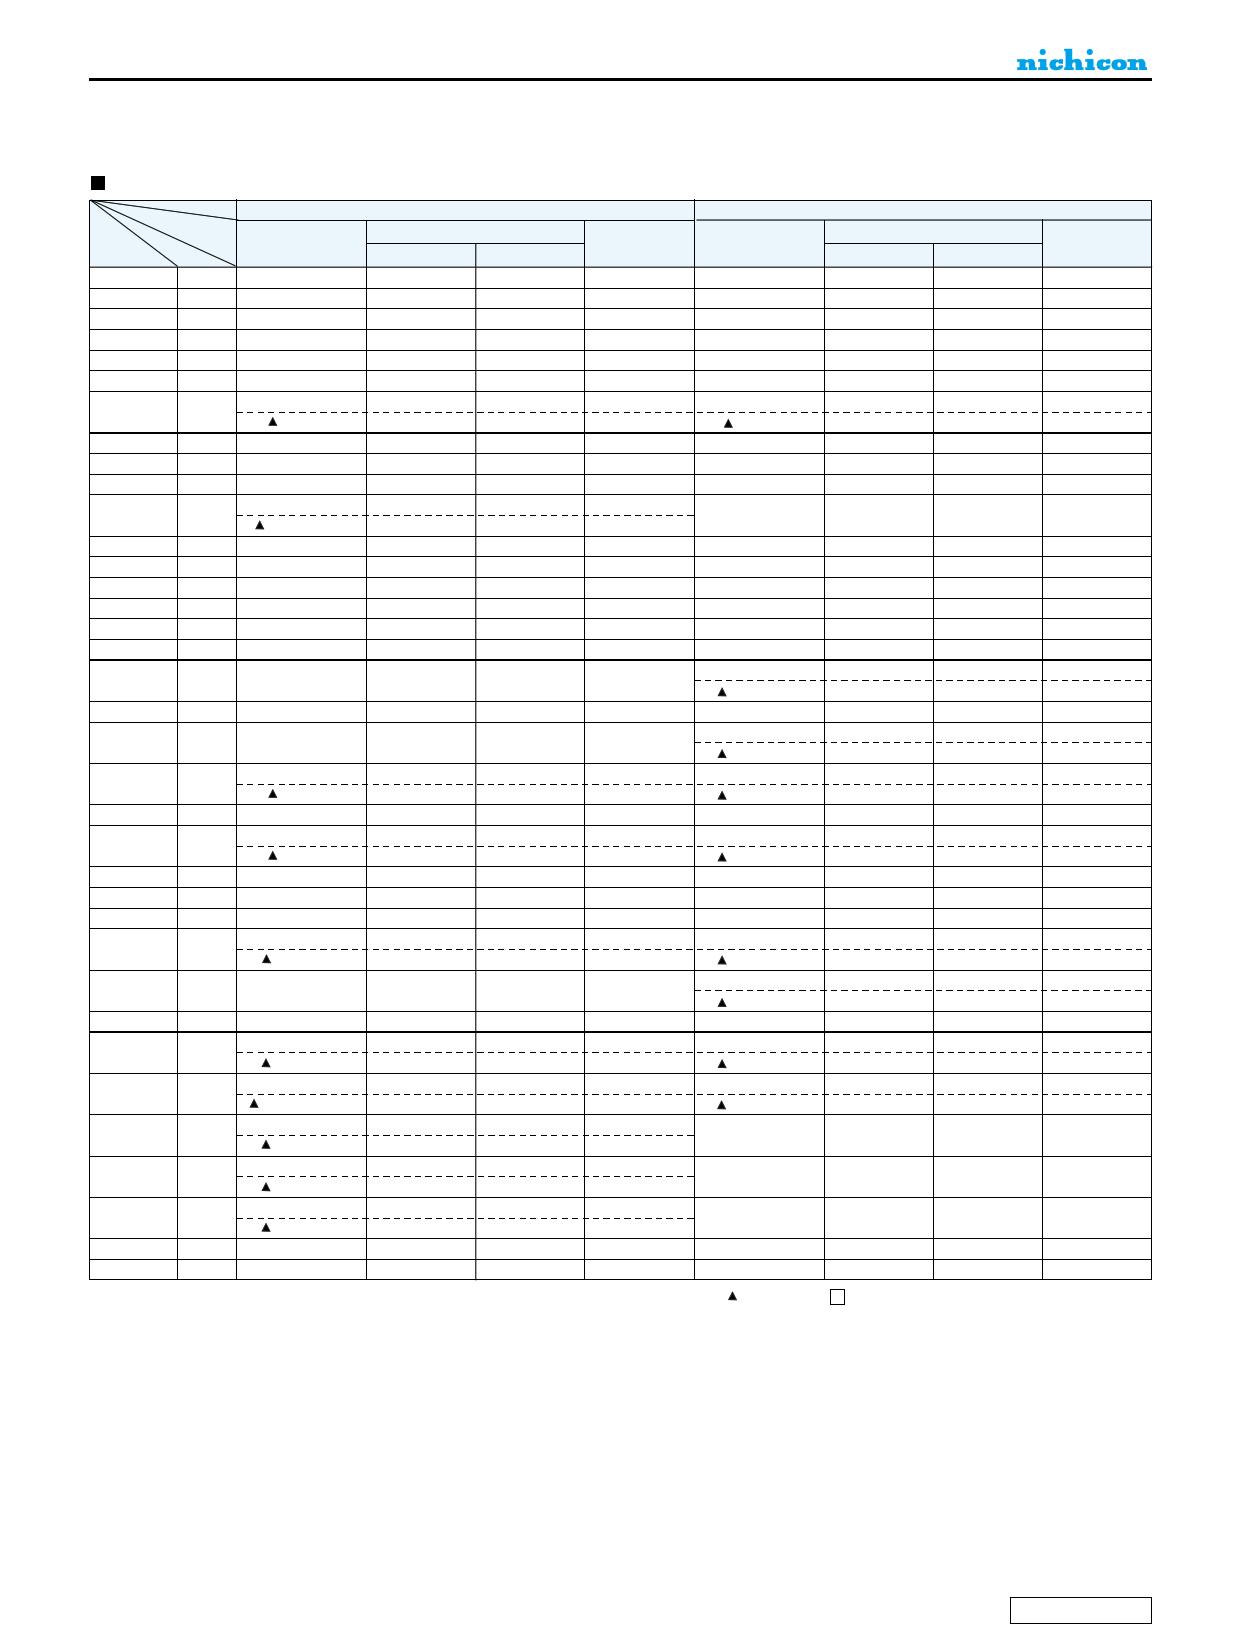 UPW2A100MED pdf, 반도체, 판매, 대치품